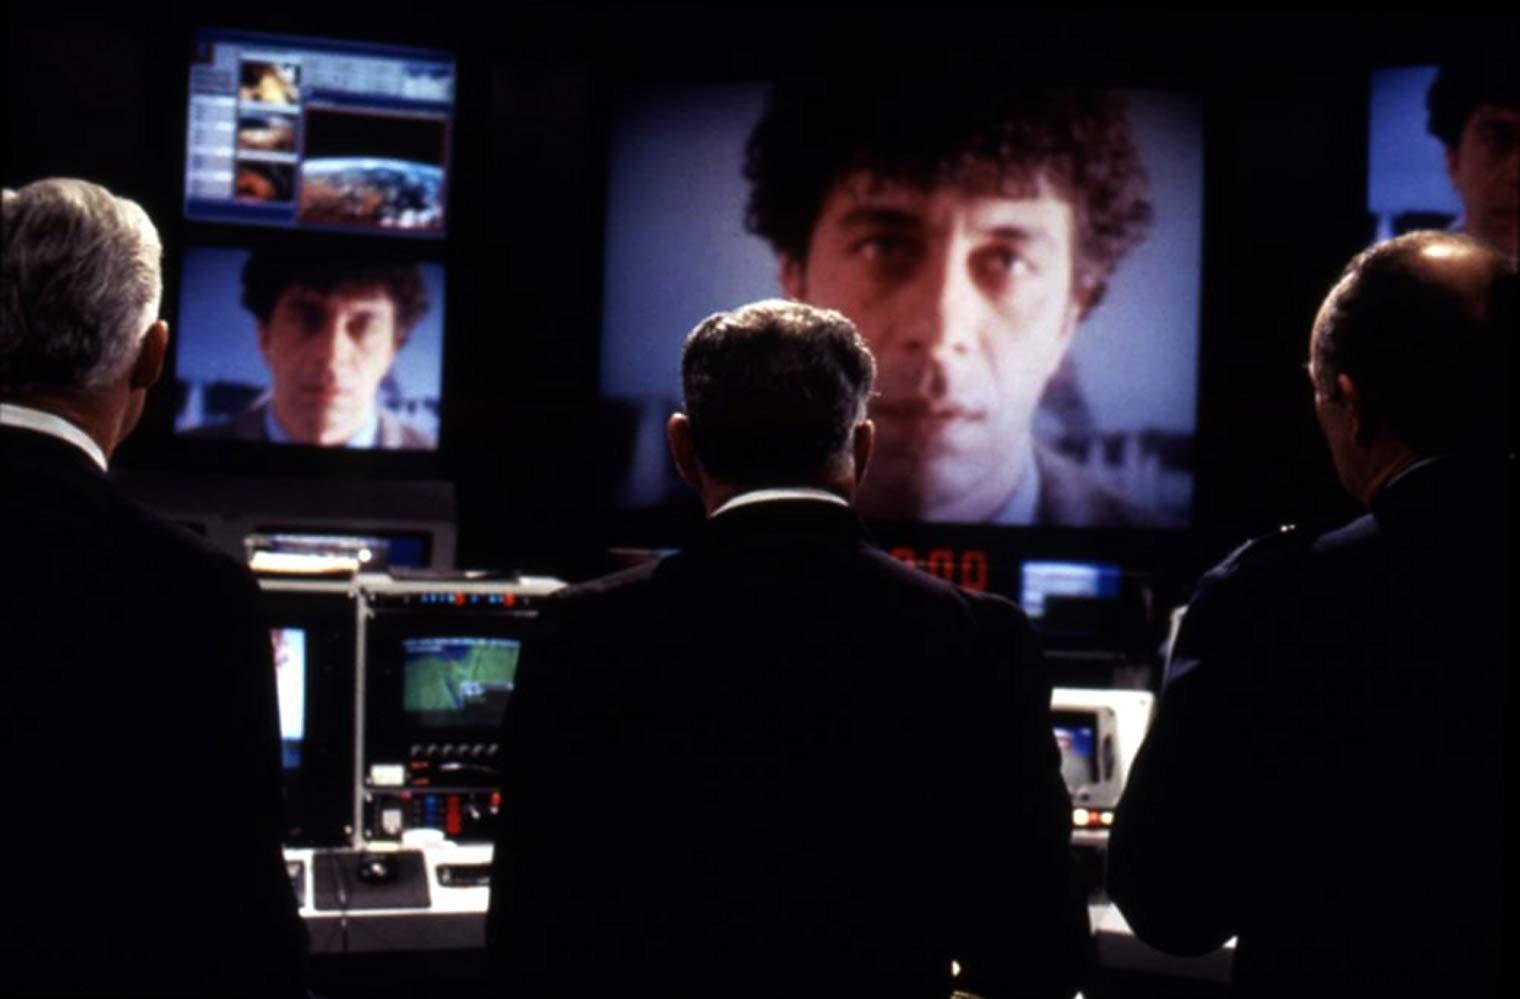 Eric Bogosian attempting a hi-tech takeover of a train in Under Siege 2: Dark Territory (1995)